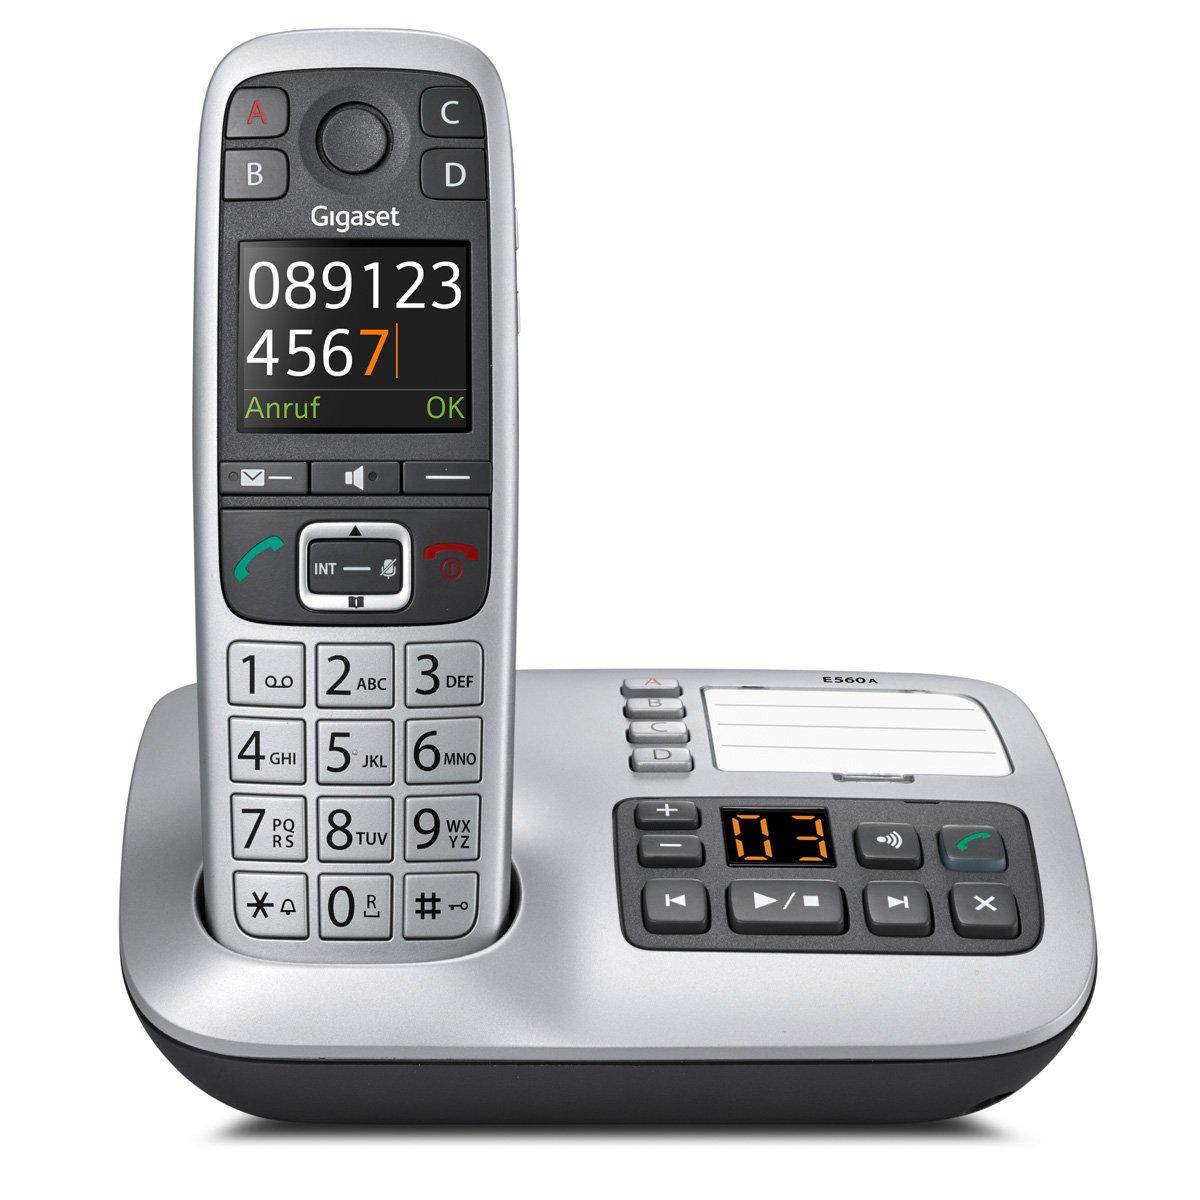 Gigaset E560A, Gigaset E560A Test, Gigaset E560A kaufen, Gigaset E560A für Senioren, Gigaset E560A IP Telefon, Gigaset E560, IP Telefon Test, Voip Telefon Test, IP Phone Test, IP Haustelefon Test, IP Telefon, IP Phone, Telefon mit Internet, Haustelefon Internet, IP Telefon Test 2018, IP Telefon Test 2019, VoiP Telefon Test 2018, VoIP Telefon Test 2019